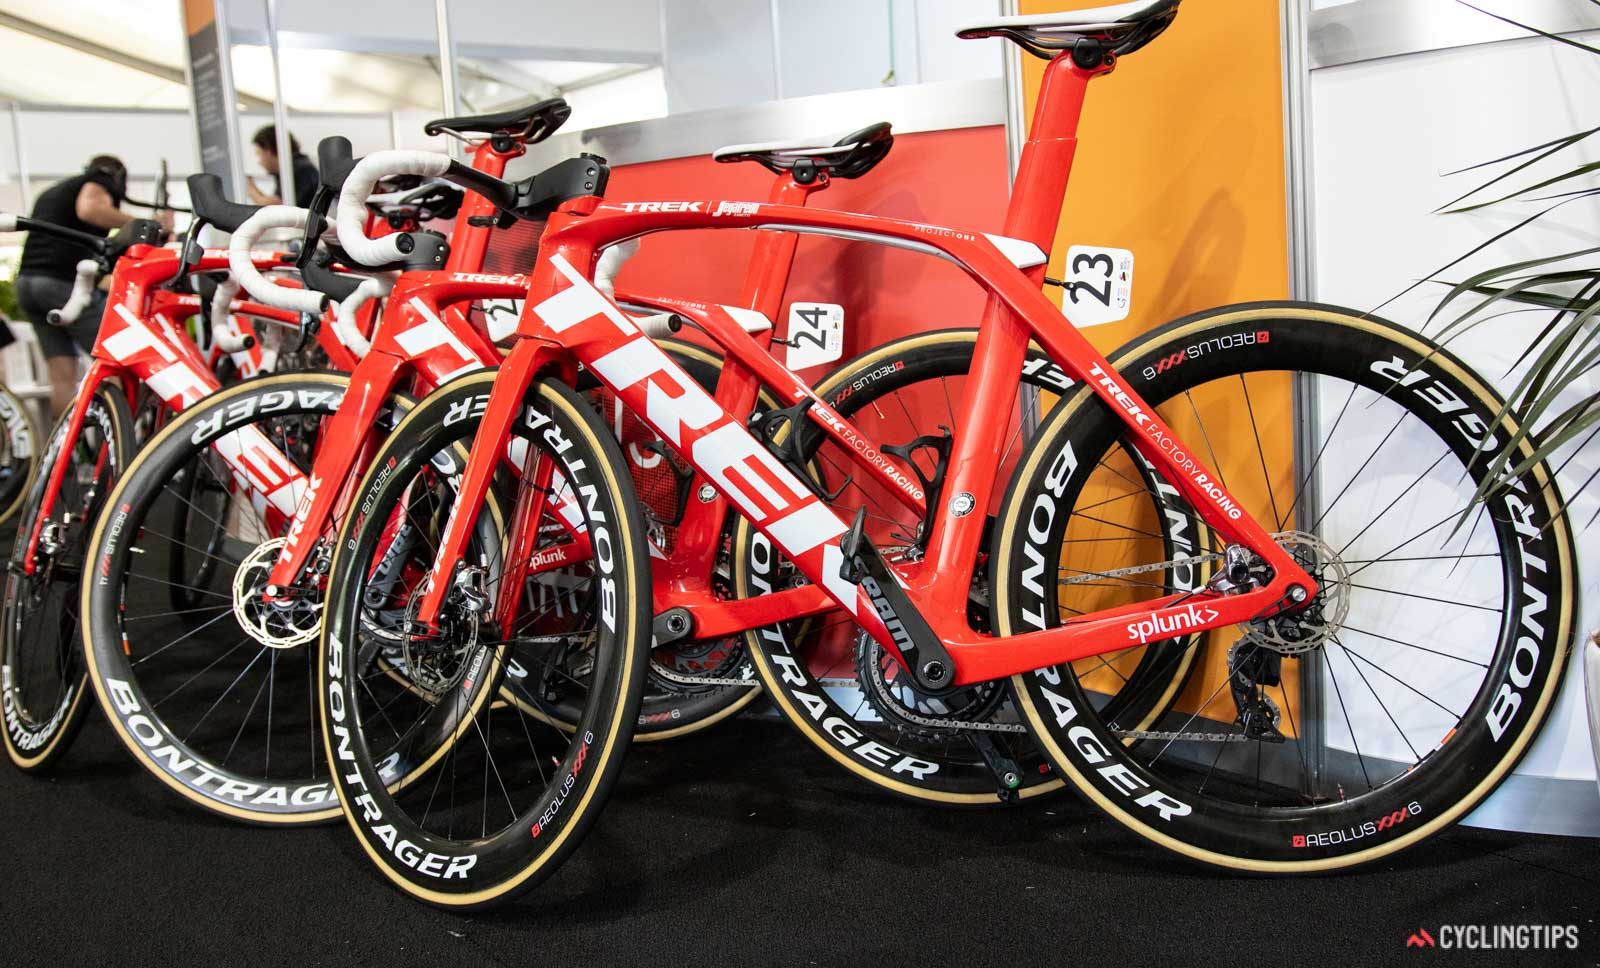 Bicicleta del equipo Trek-Segafredo